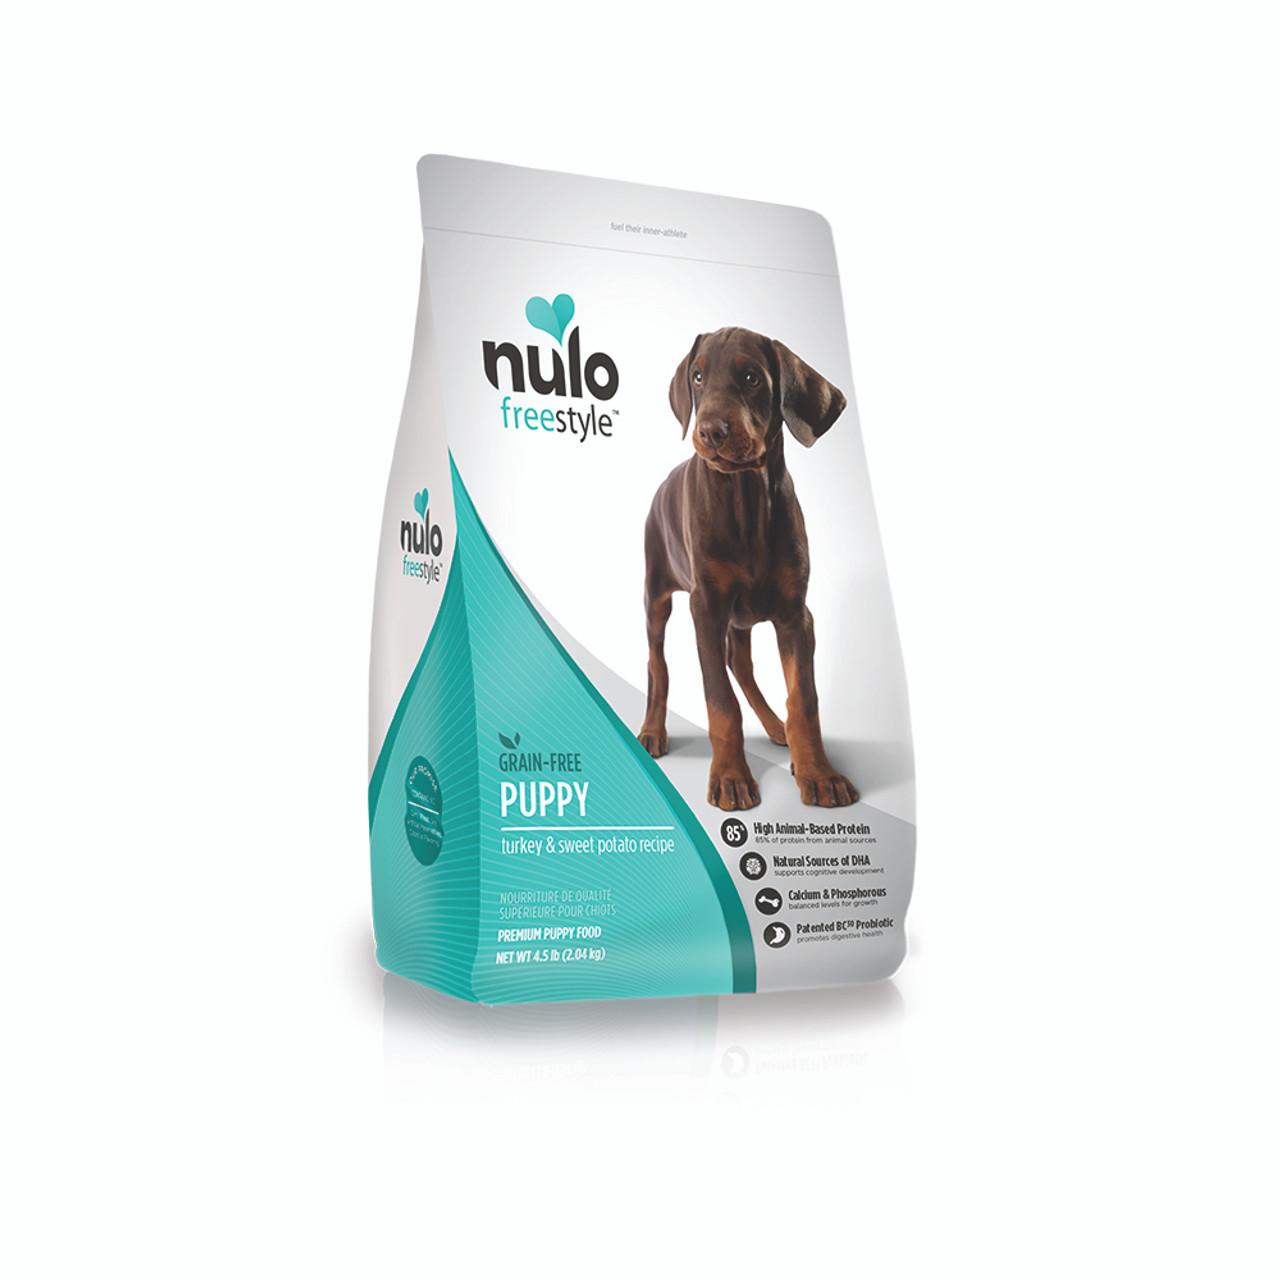 Nulo Freestyle Grain-Free Puppy Turkey & Sweet Potato Dry Dog Food